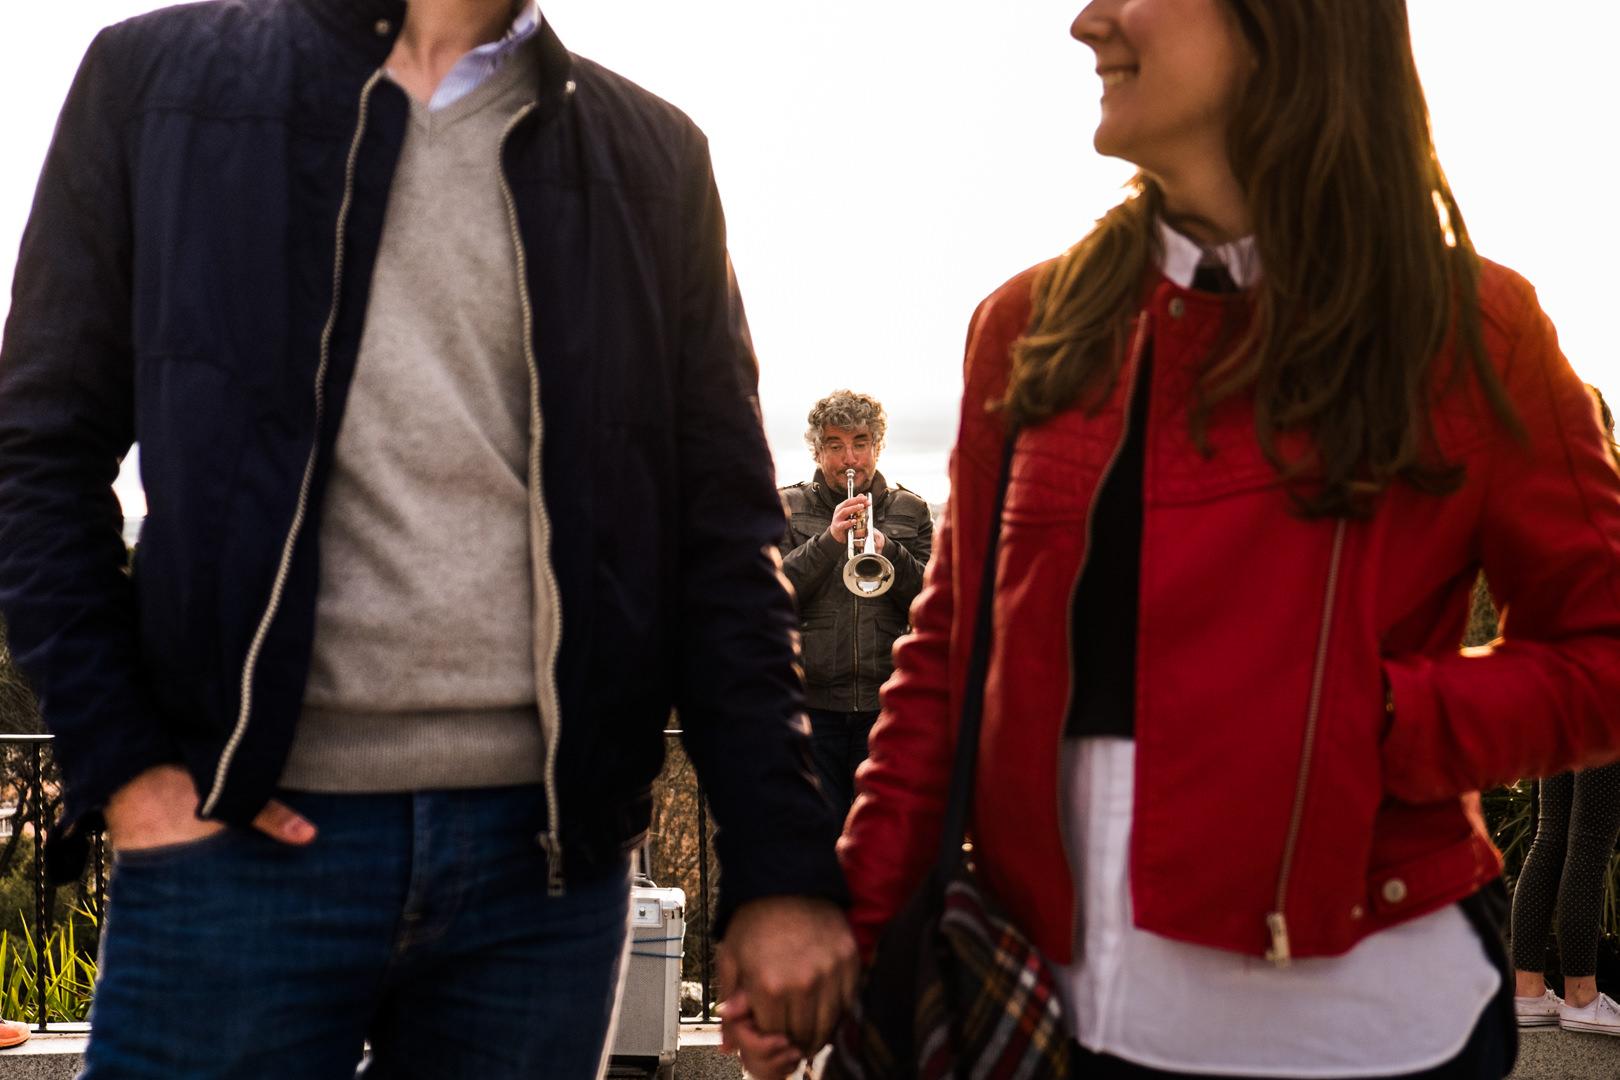 Preboda-Madrid-Maria-David-engagement-Rafael-Torres-fotografo-bodas-sevilla-madrid-barcelona-wedding-photographer--19.jpg